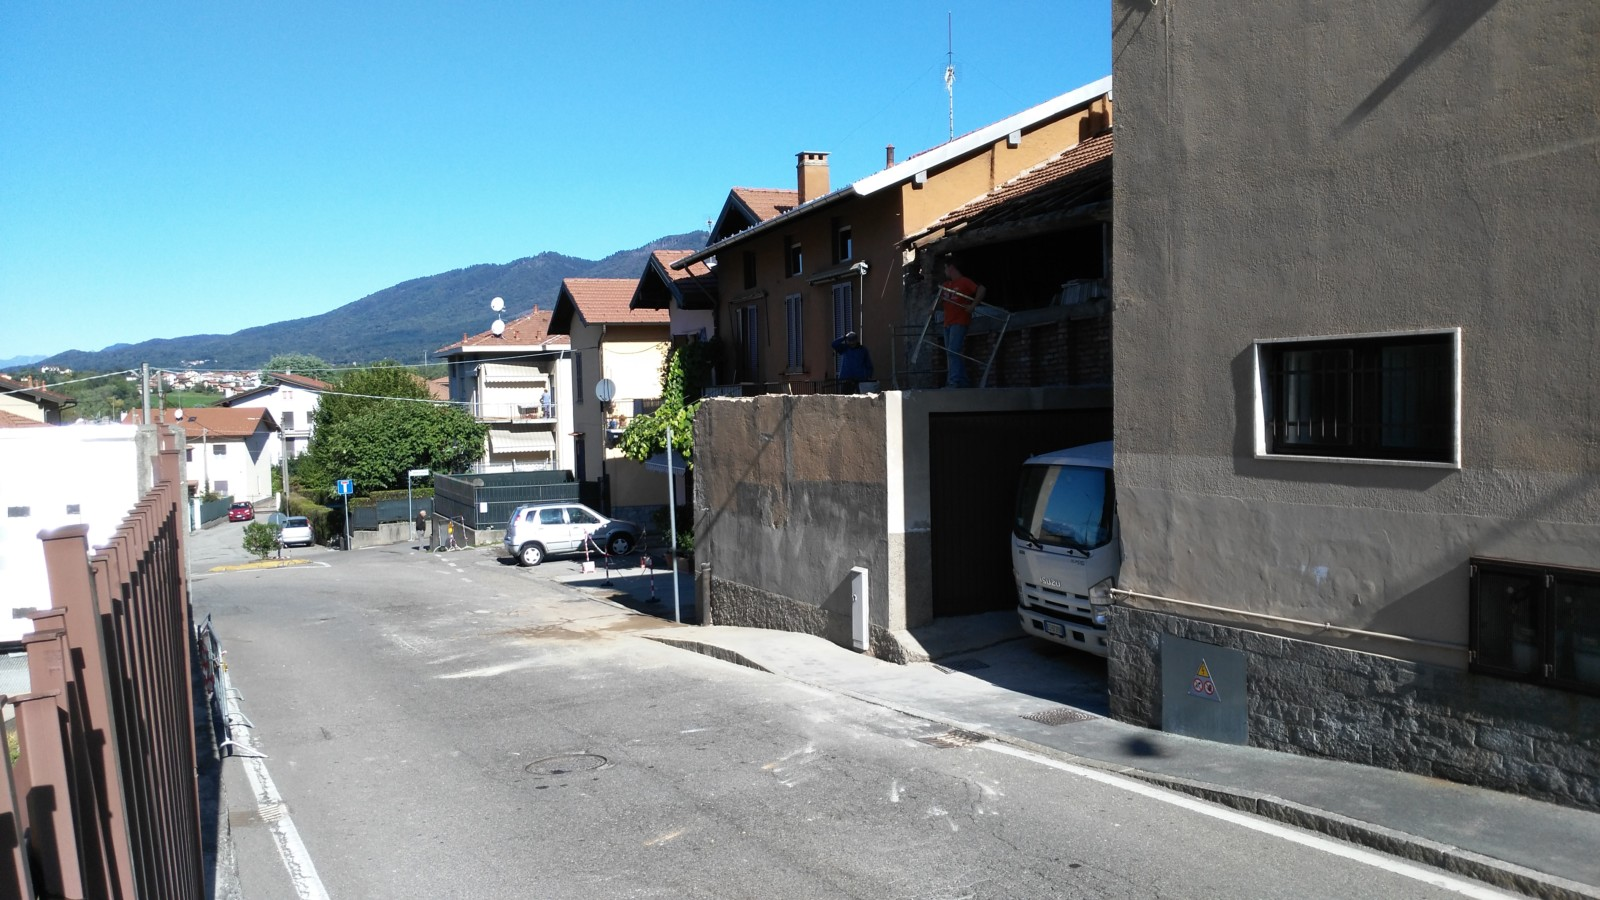 via Dezza Varese